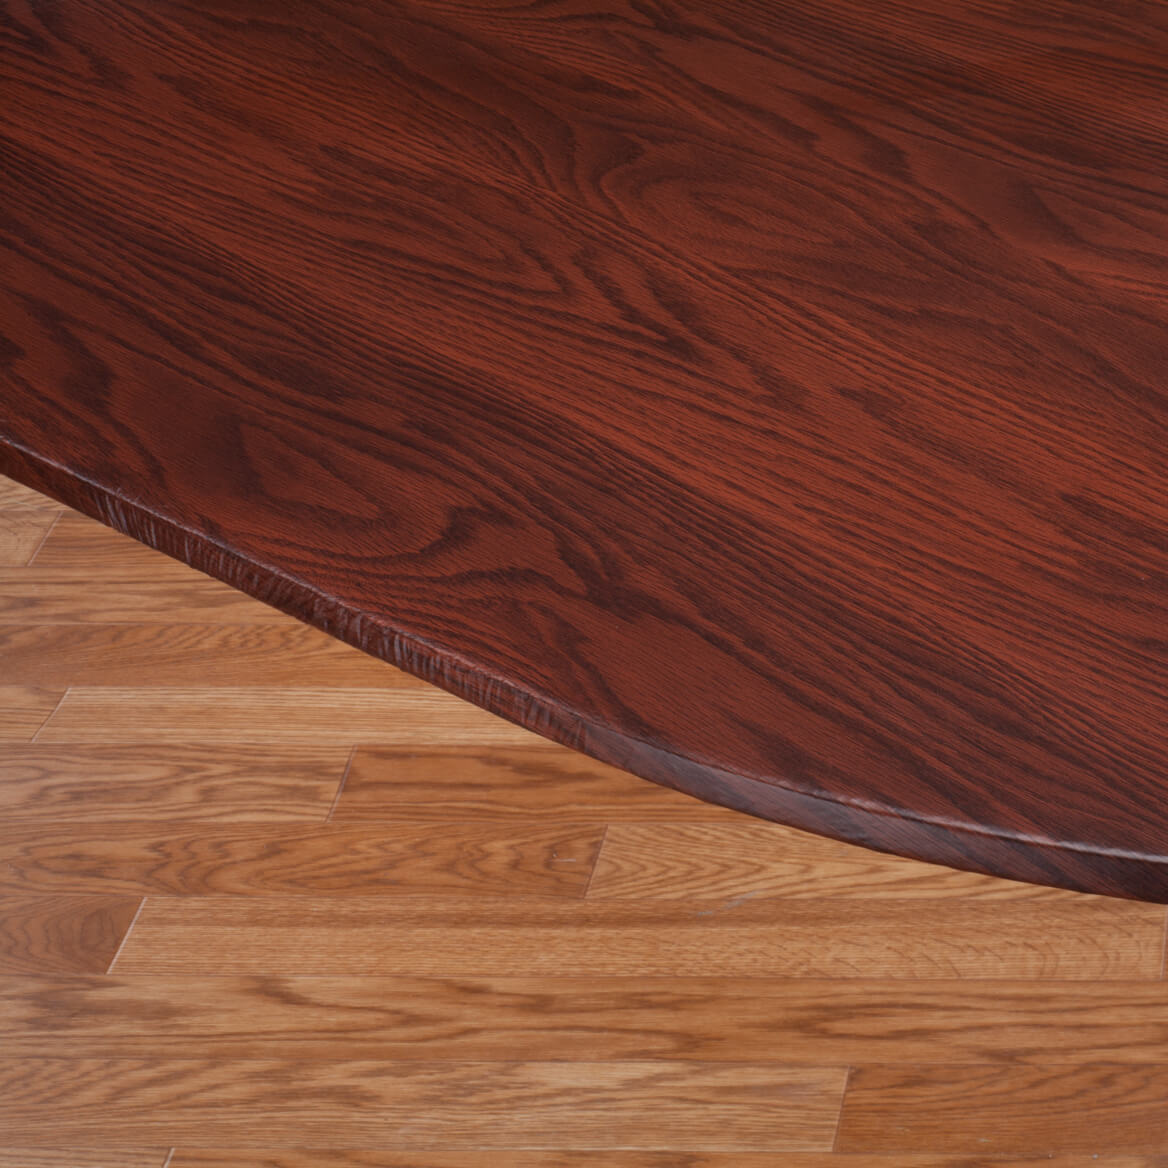 Wood Grain Vinyl Elasticized Table Cover-344622